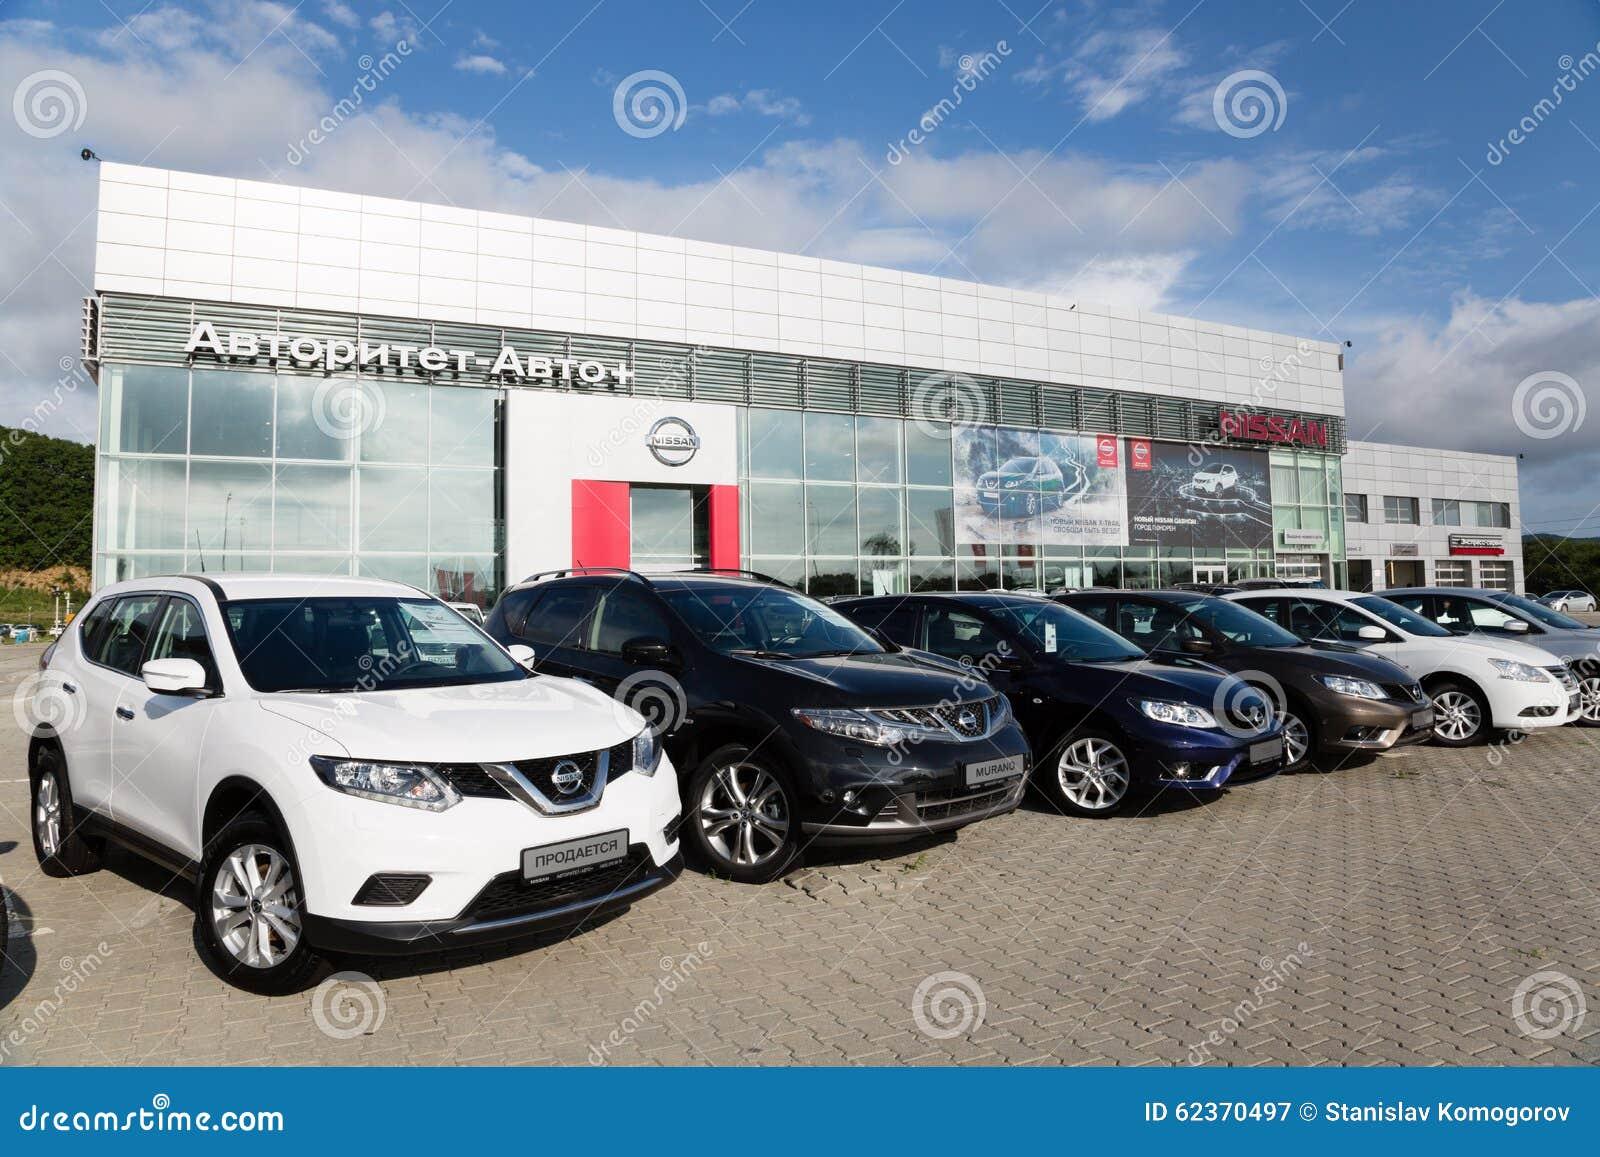 Nissan car dealership editorial image for Motor city car dealership